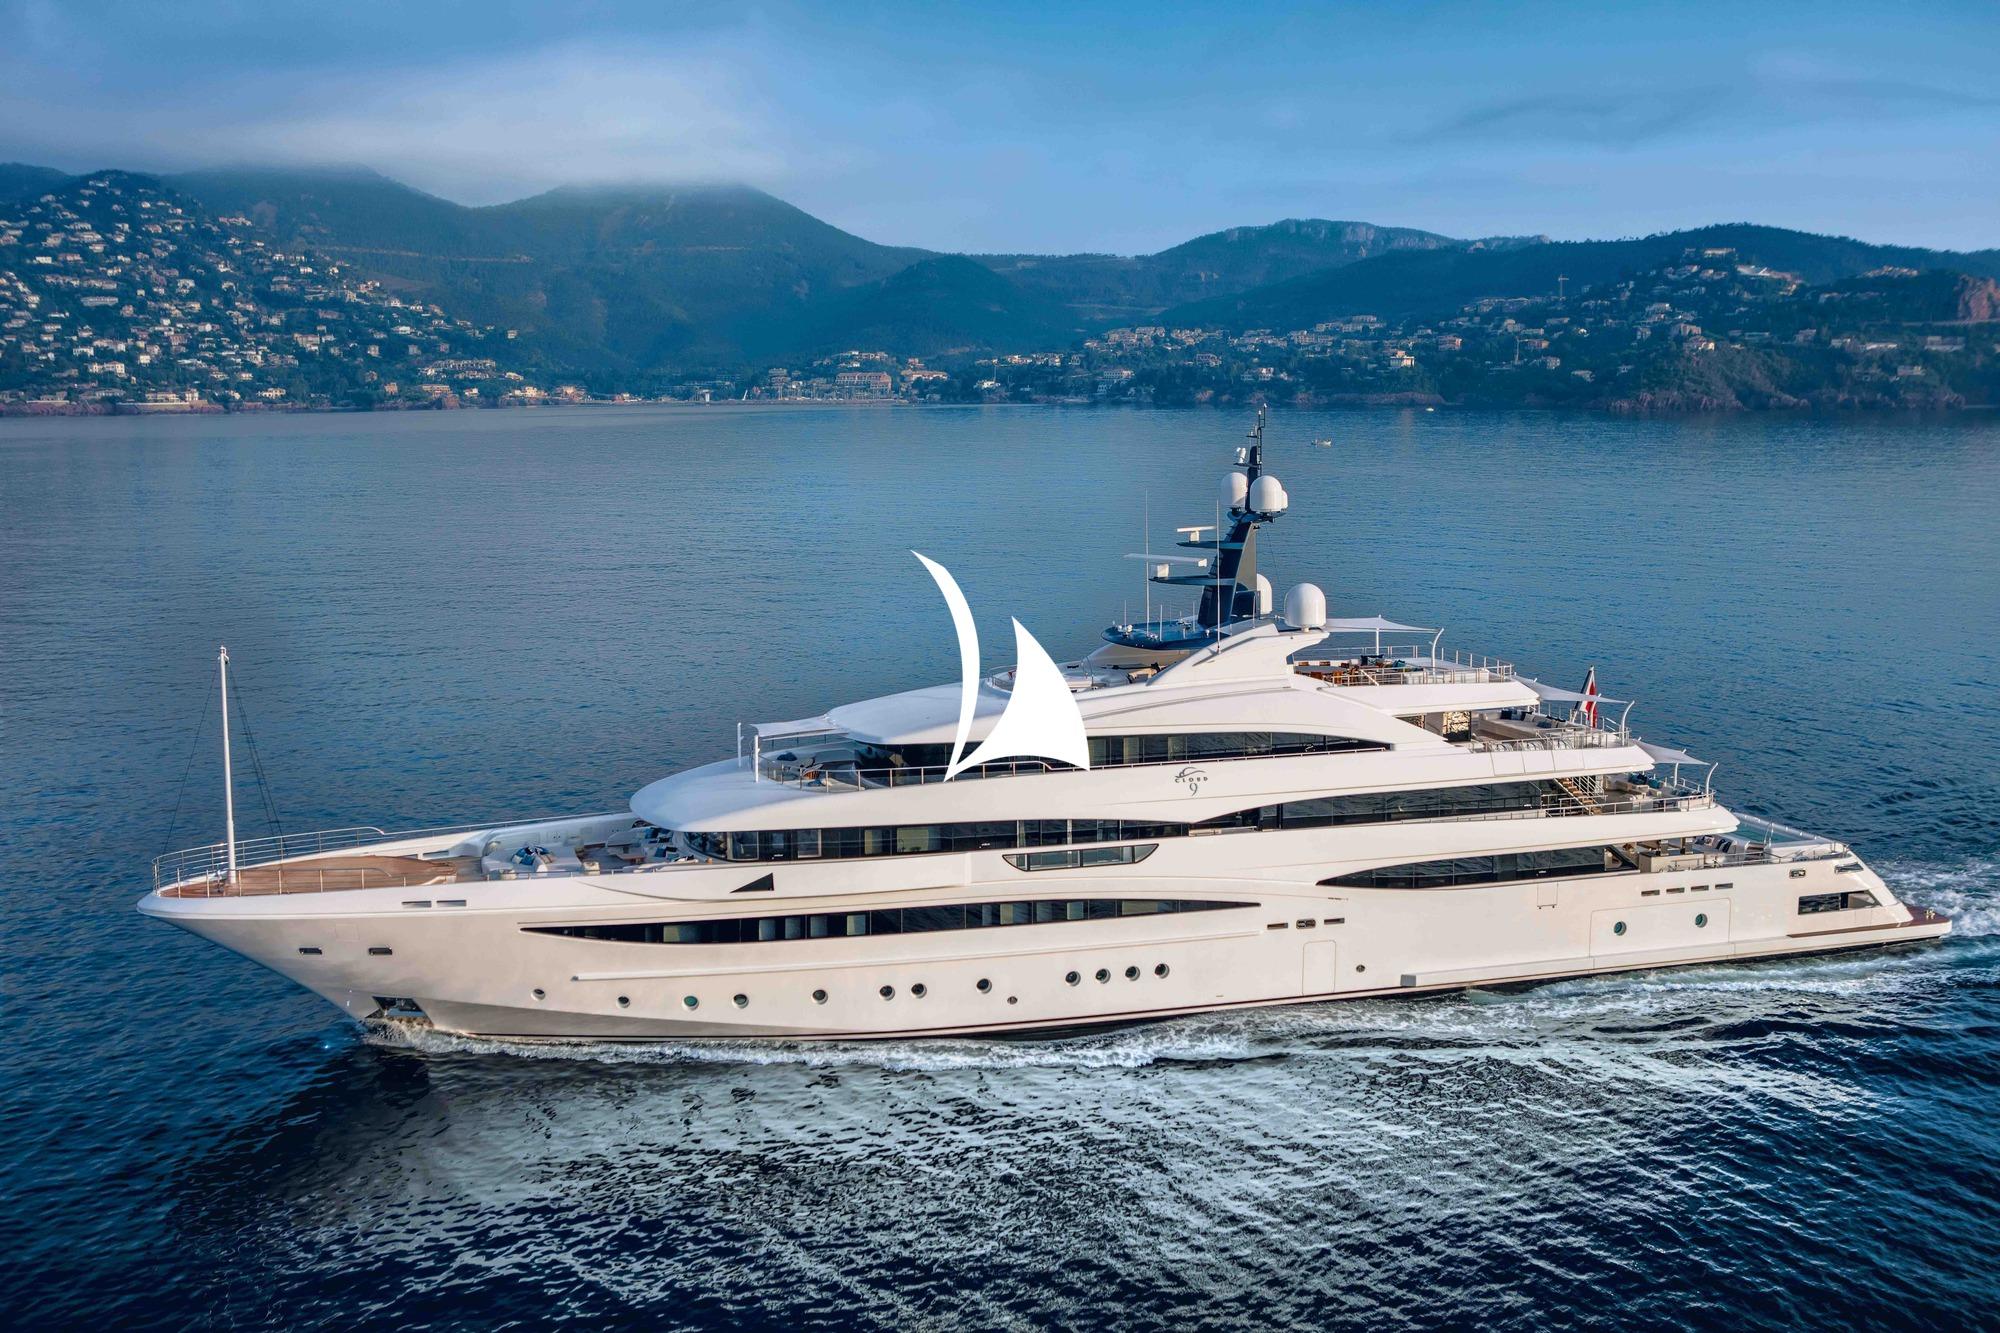 motor yacht, crewed motor yacht, yacht cloud 9, cloud 9